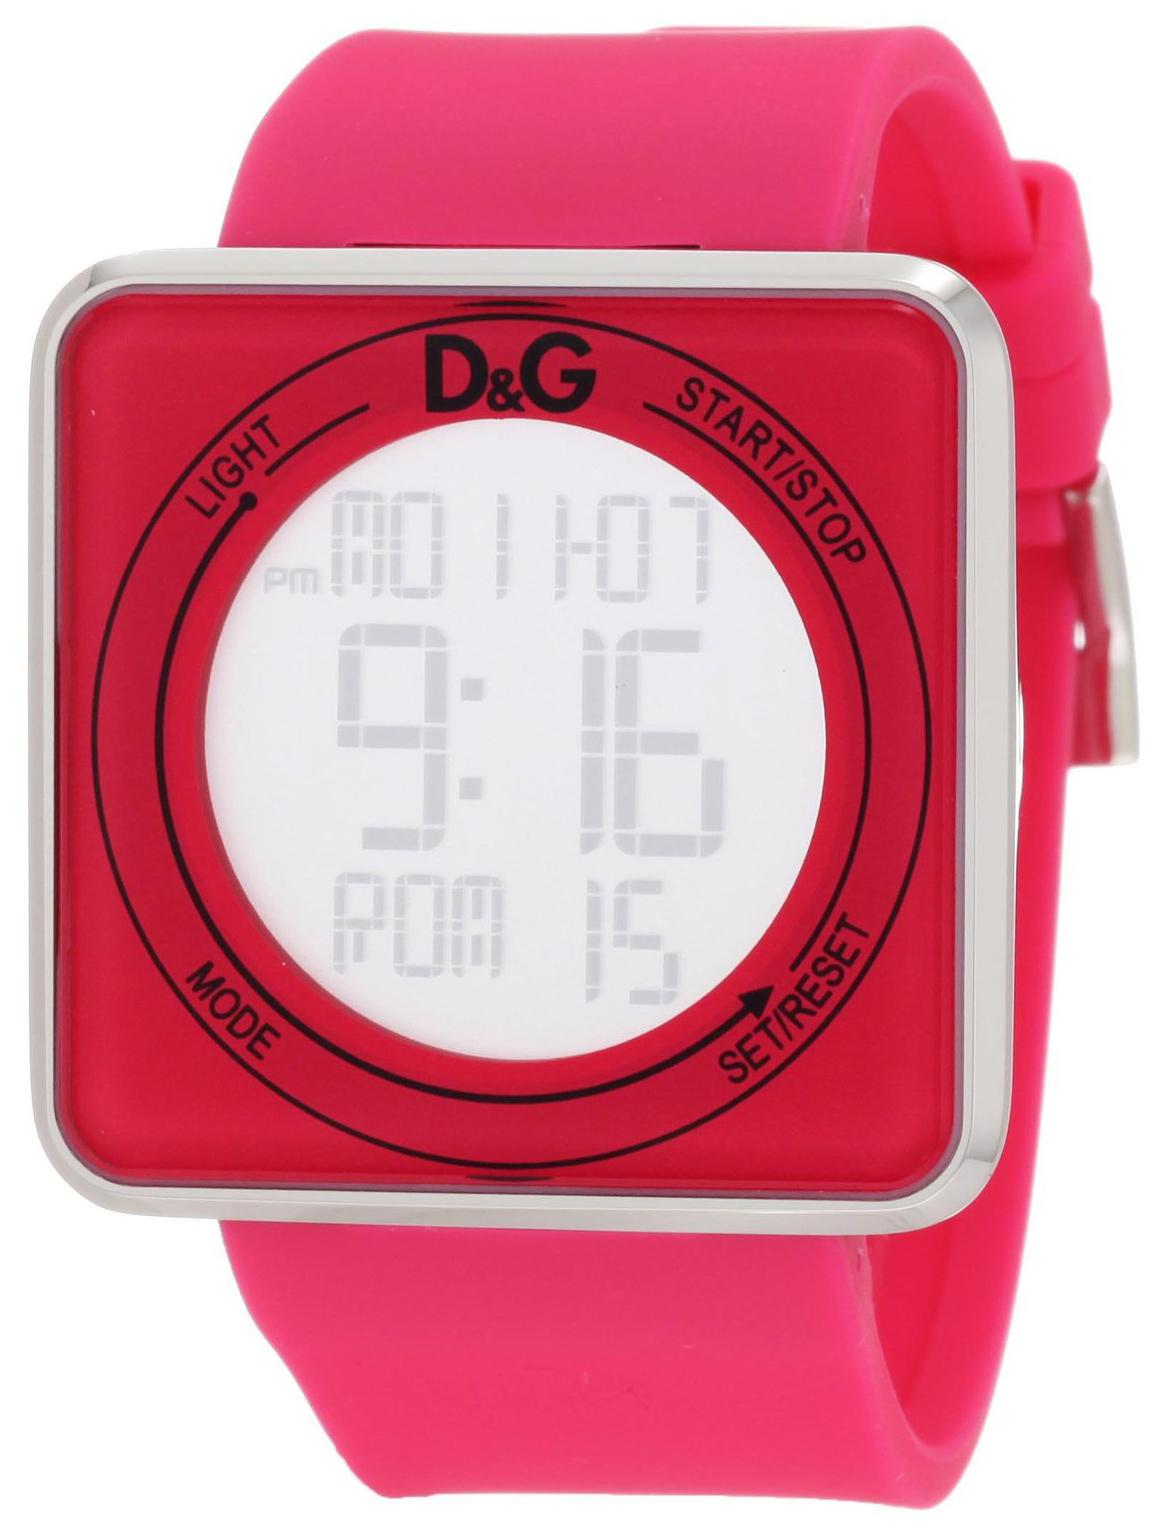 Dolce & Gabbana D&G High Contact Dameklokke DW0737 - Dolce & Gabbana D&G